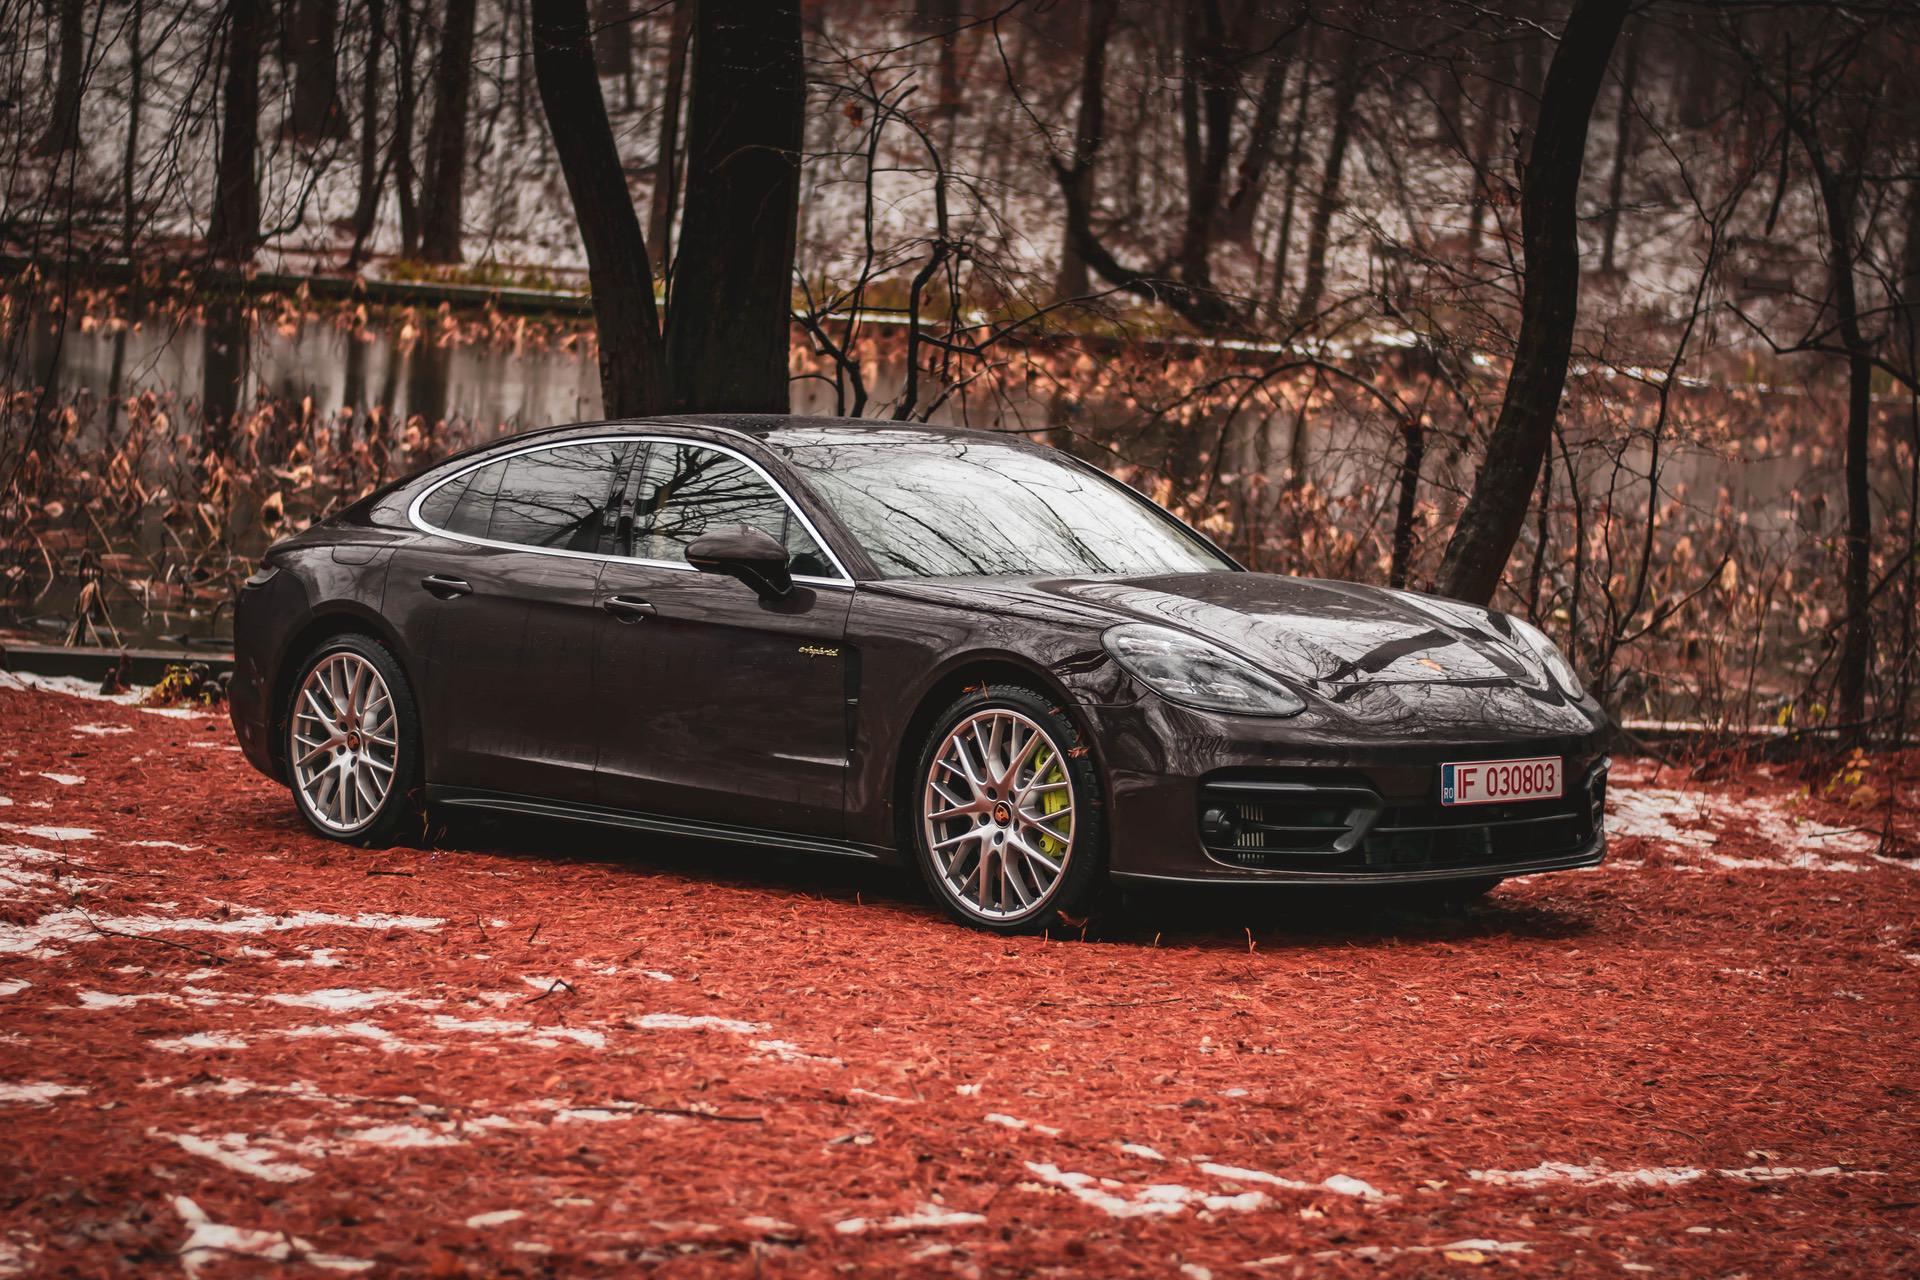 2021 Porsche Panamera 4S E Hybrid test drive 82